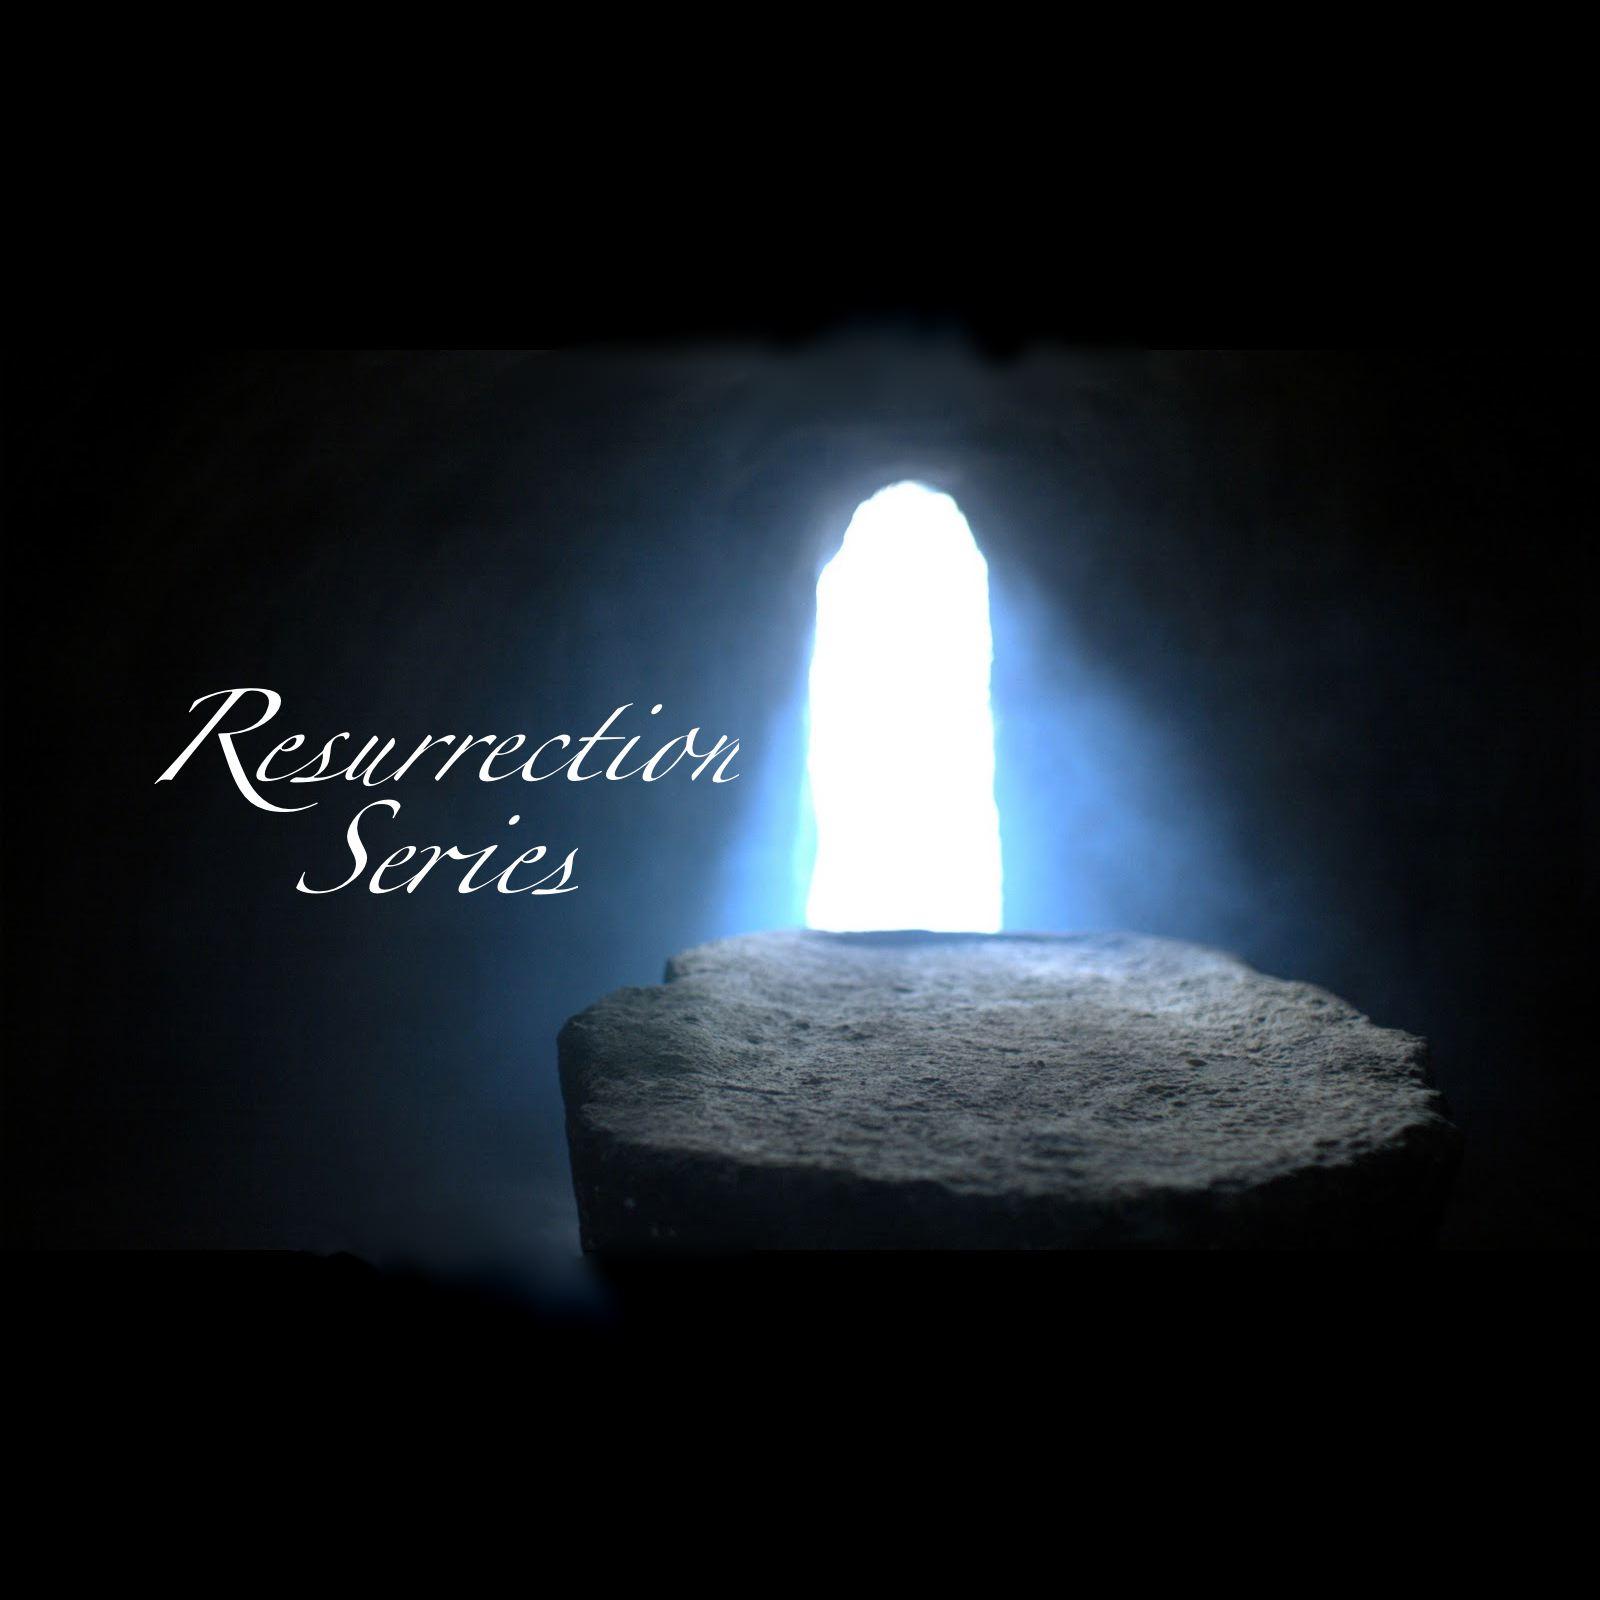 4-20-14 Resurrection Series: My Restoration